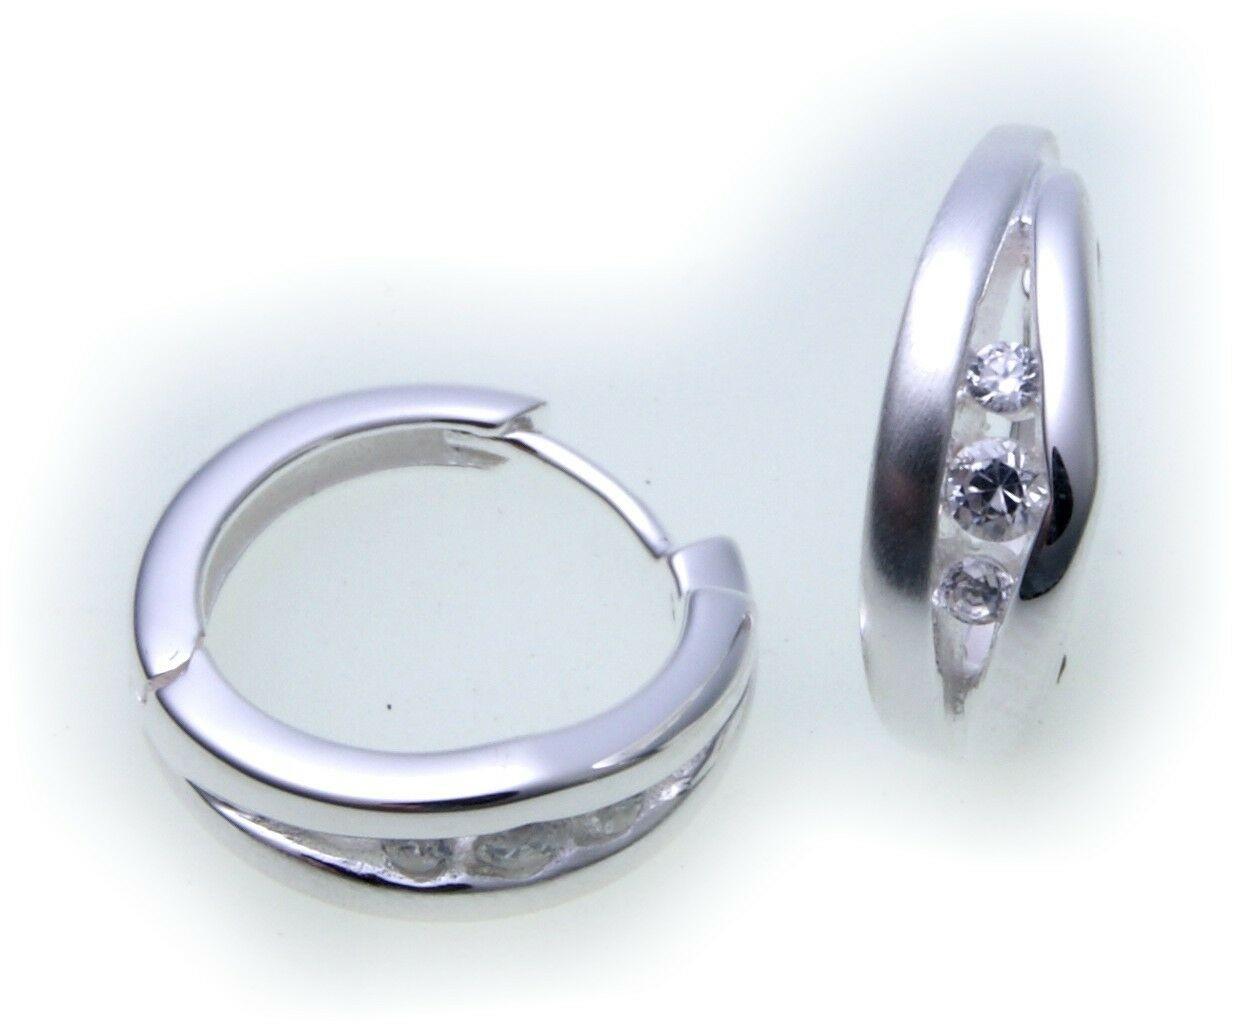 edle Damen Ohrringe Klapp Creolen Zirkonia Silber 925 Qualität Sterlingsilber